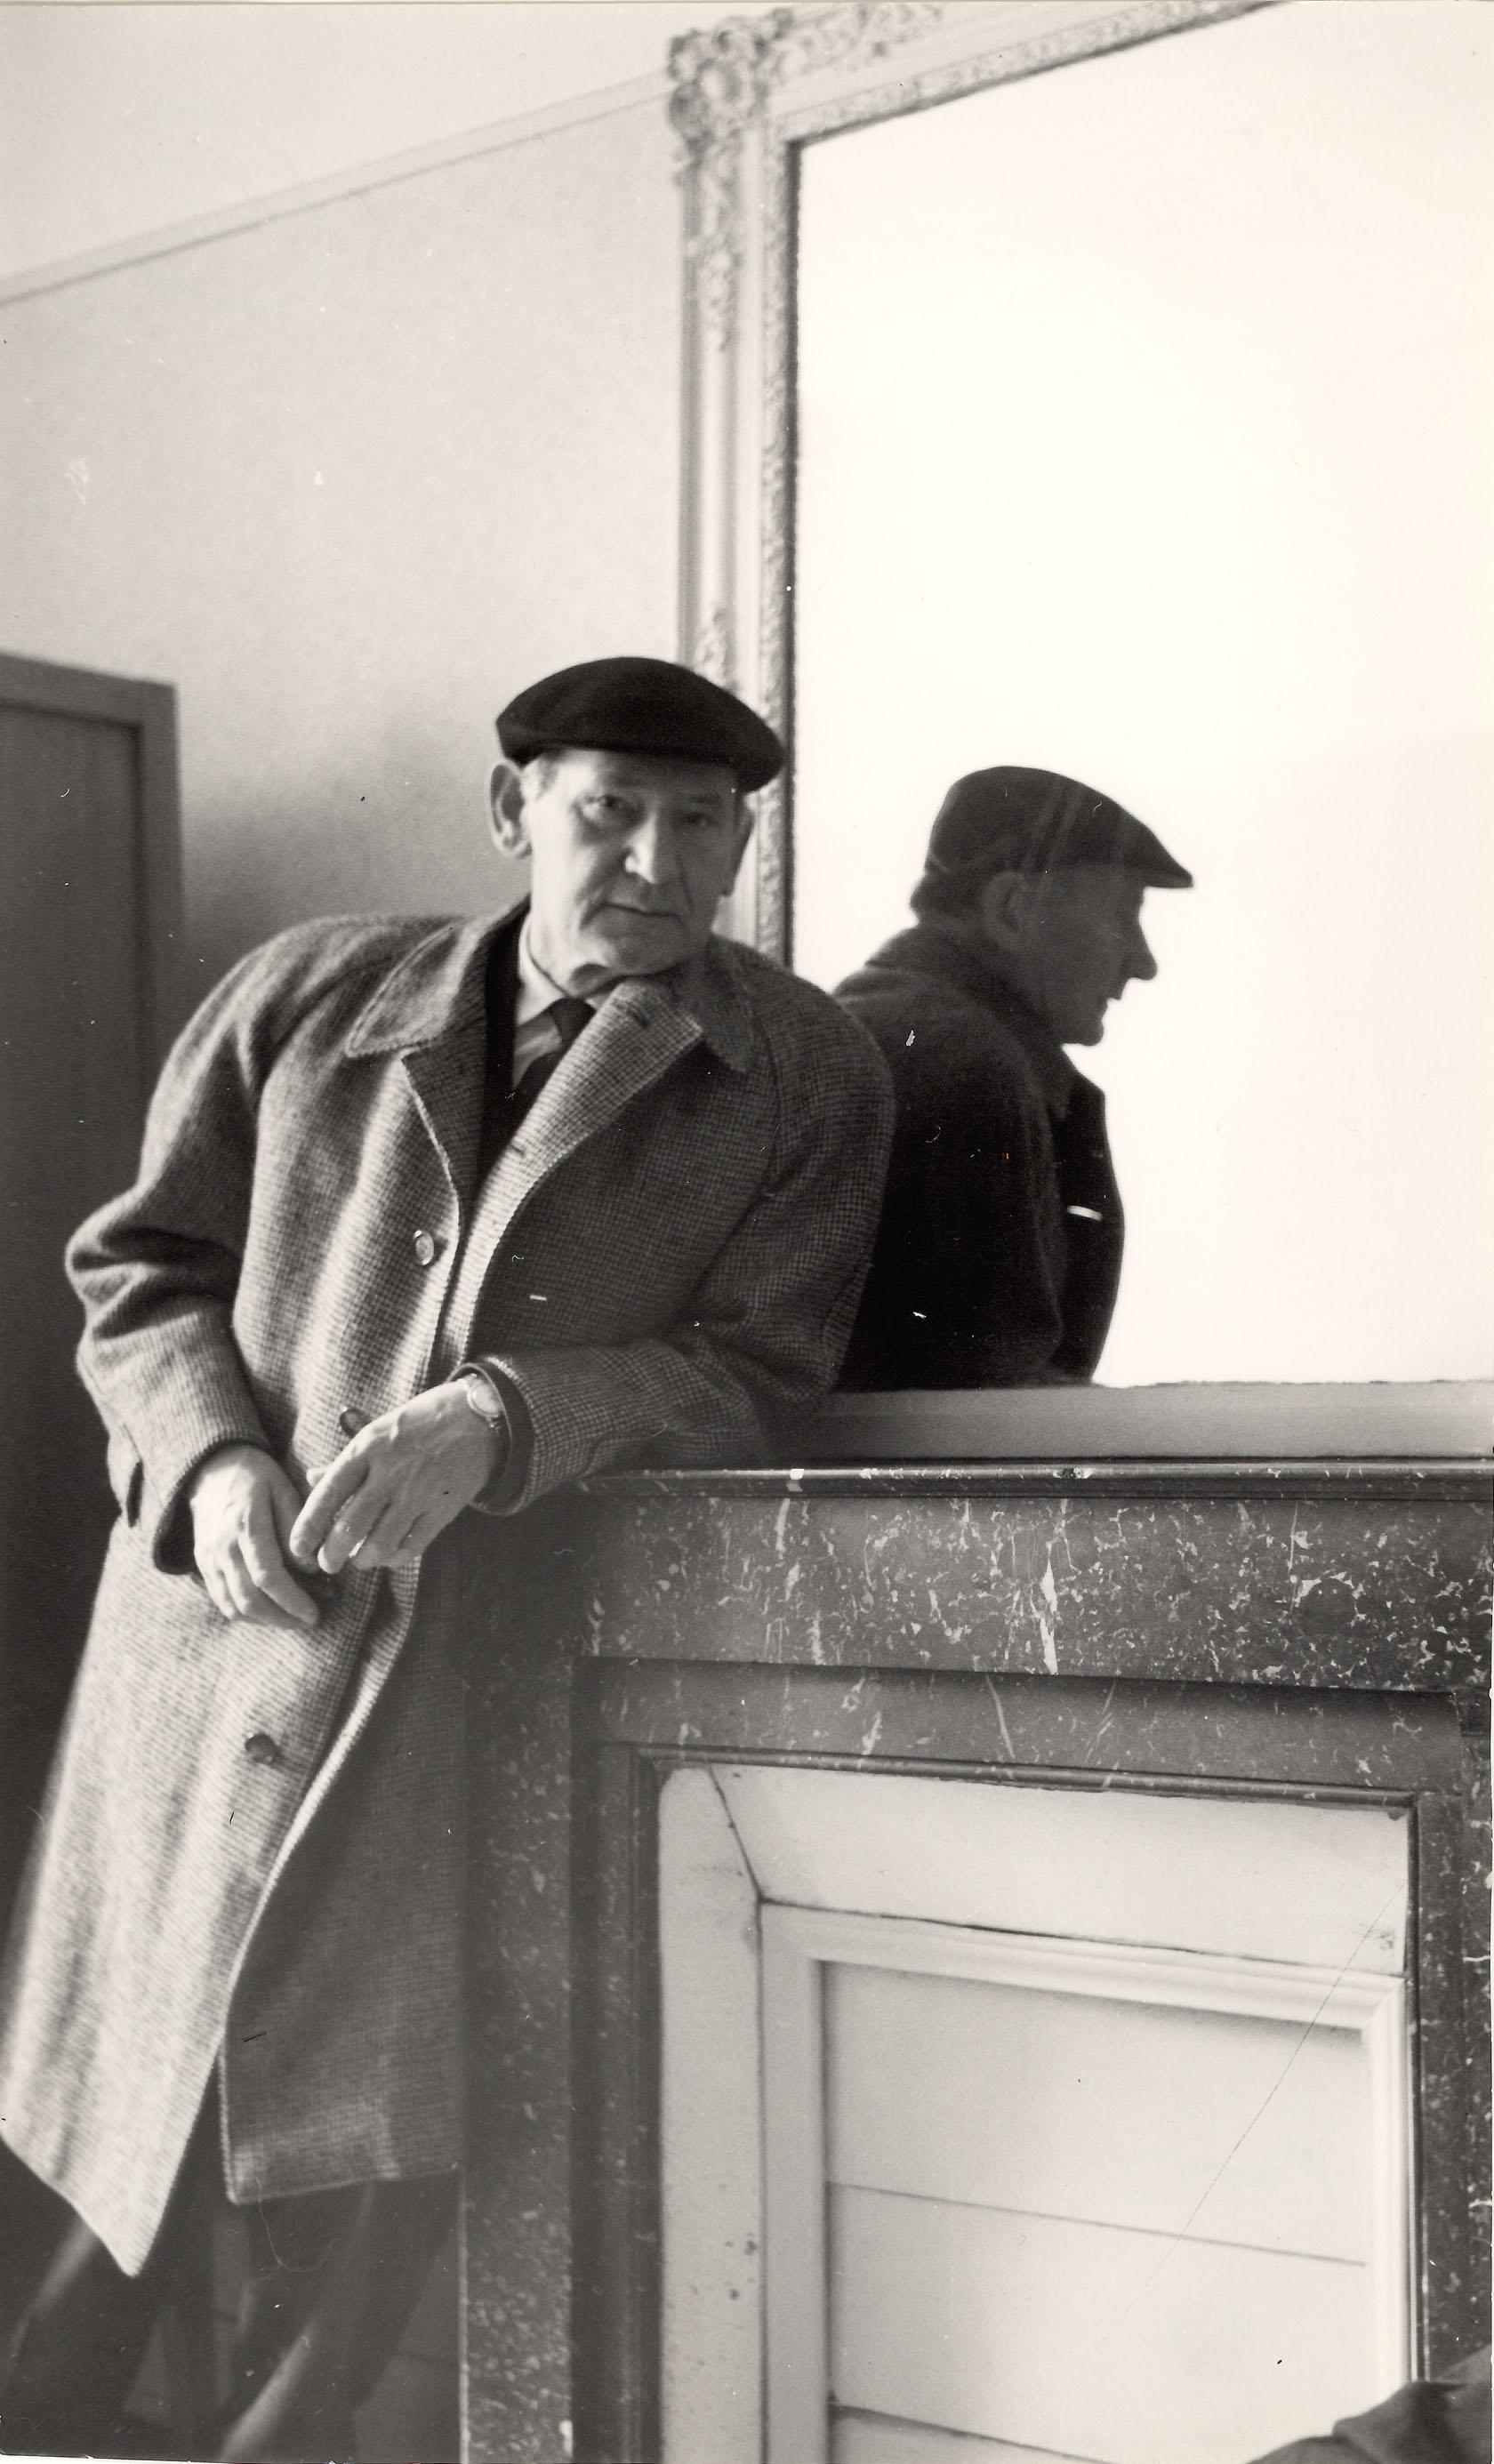 Image of Anton Stankowski from Wikidata